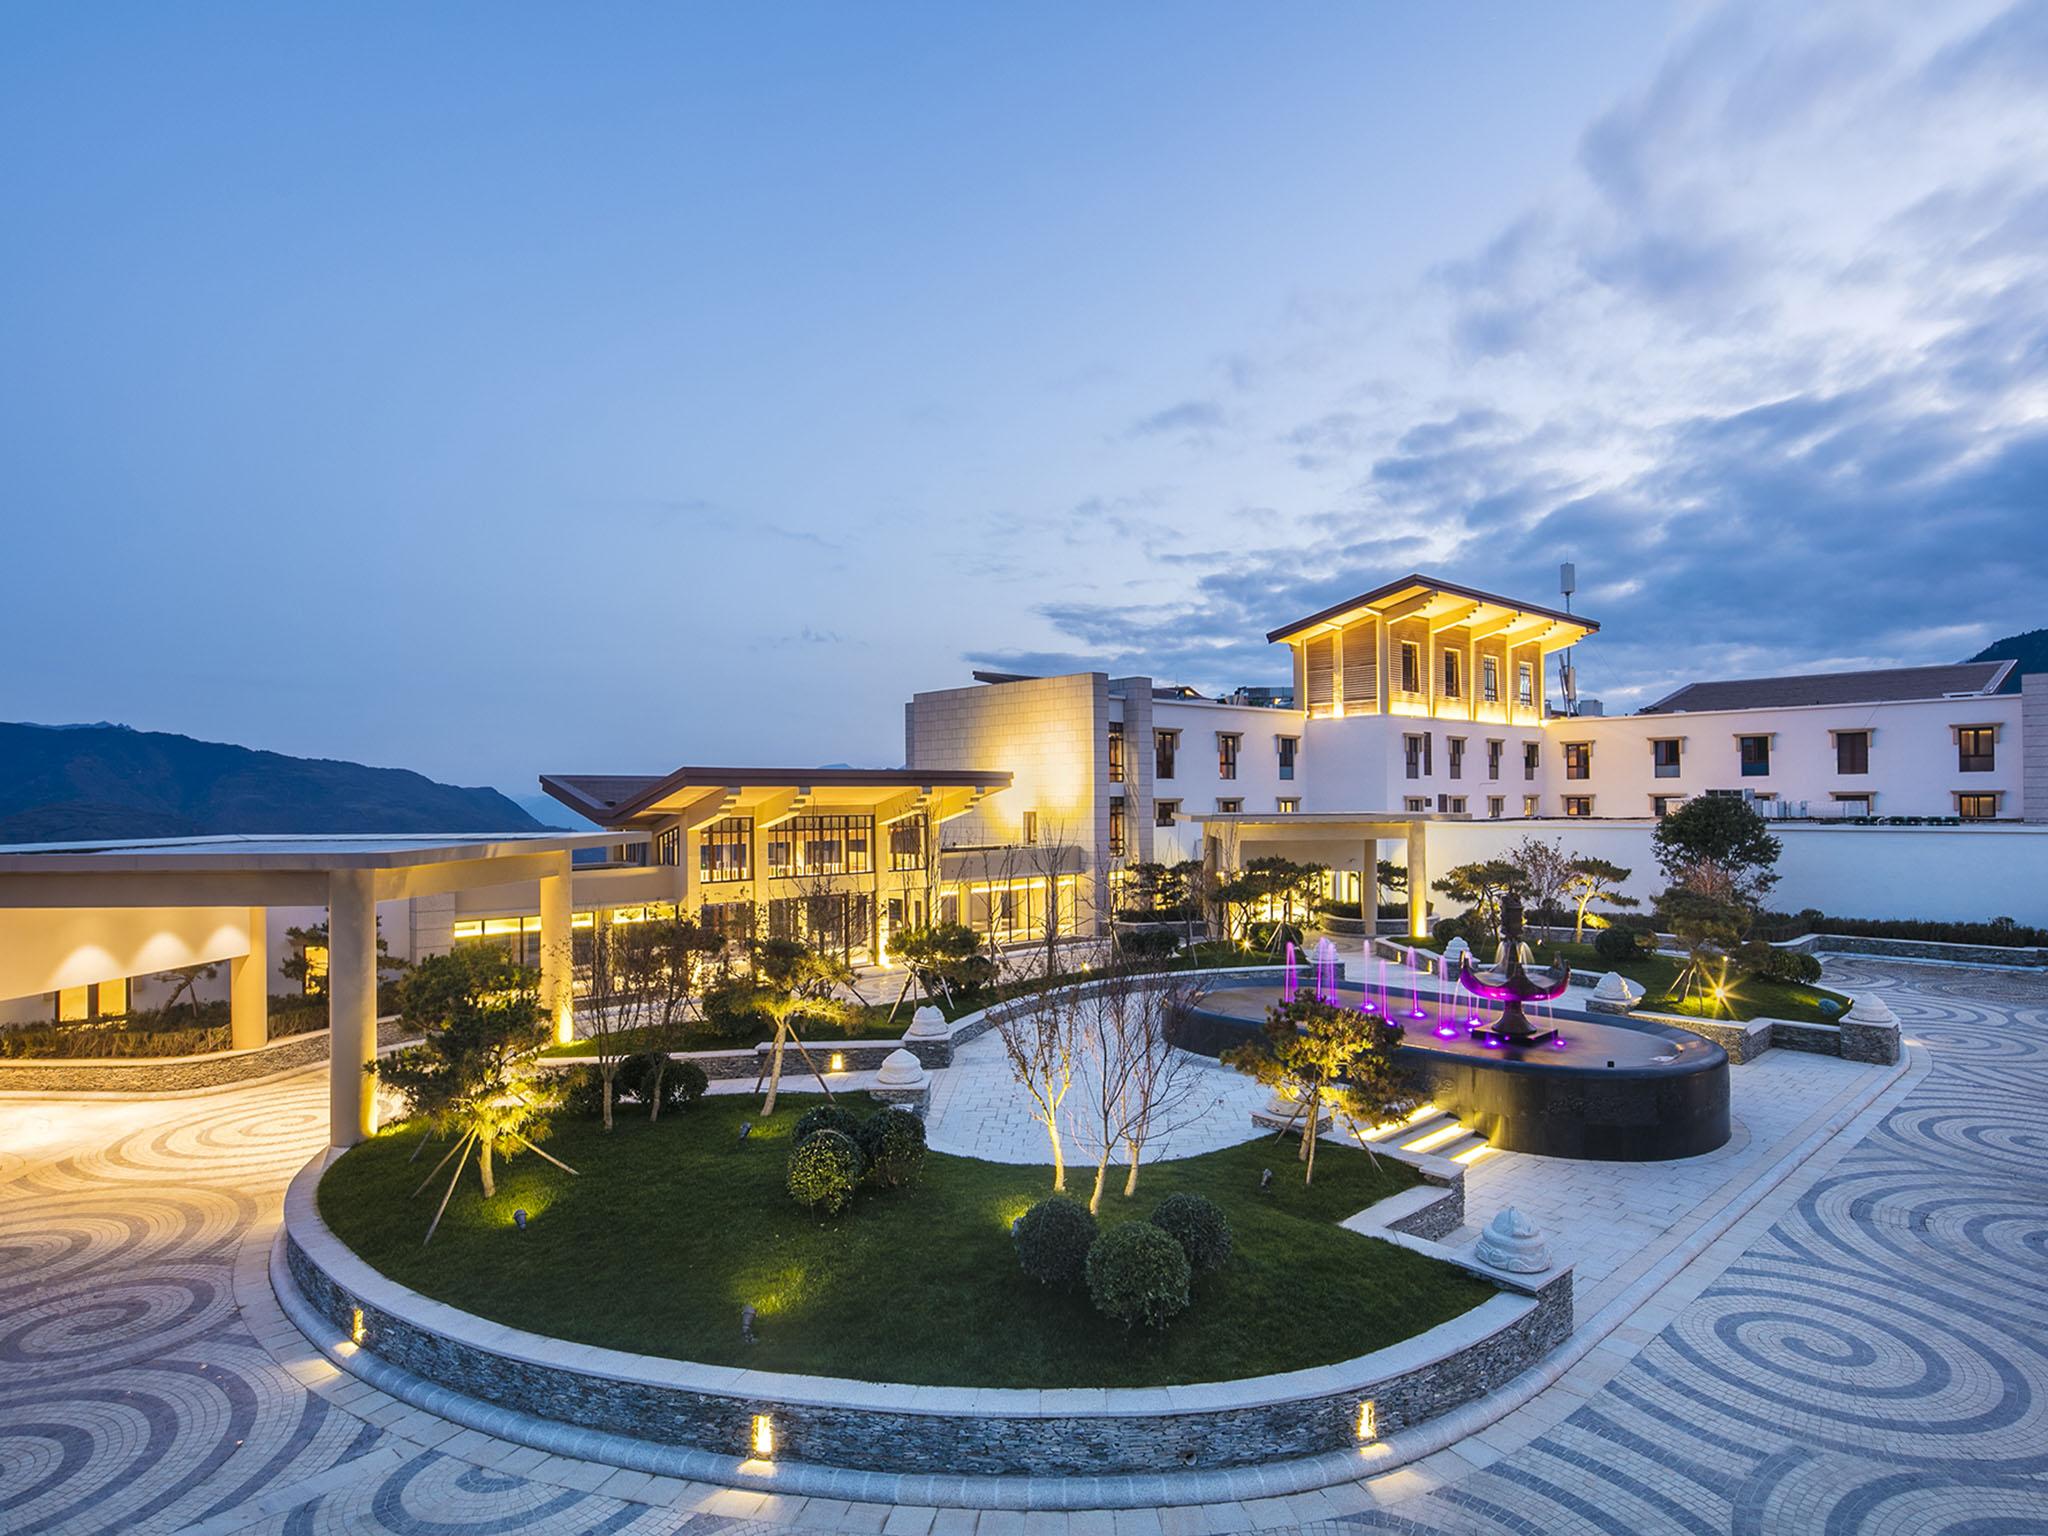 Otel – Banyan Tree Jiuzhaigou